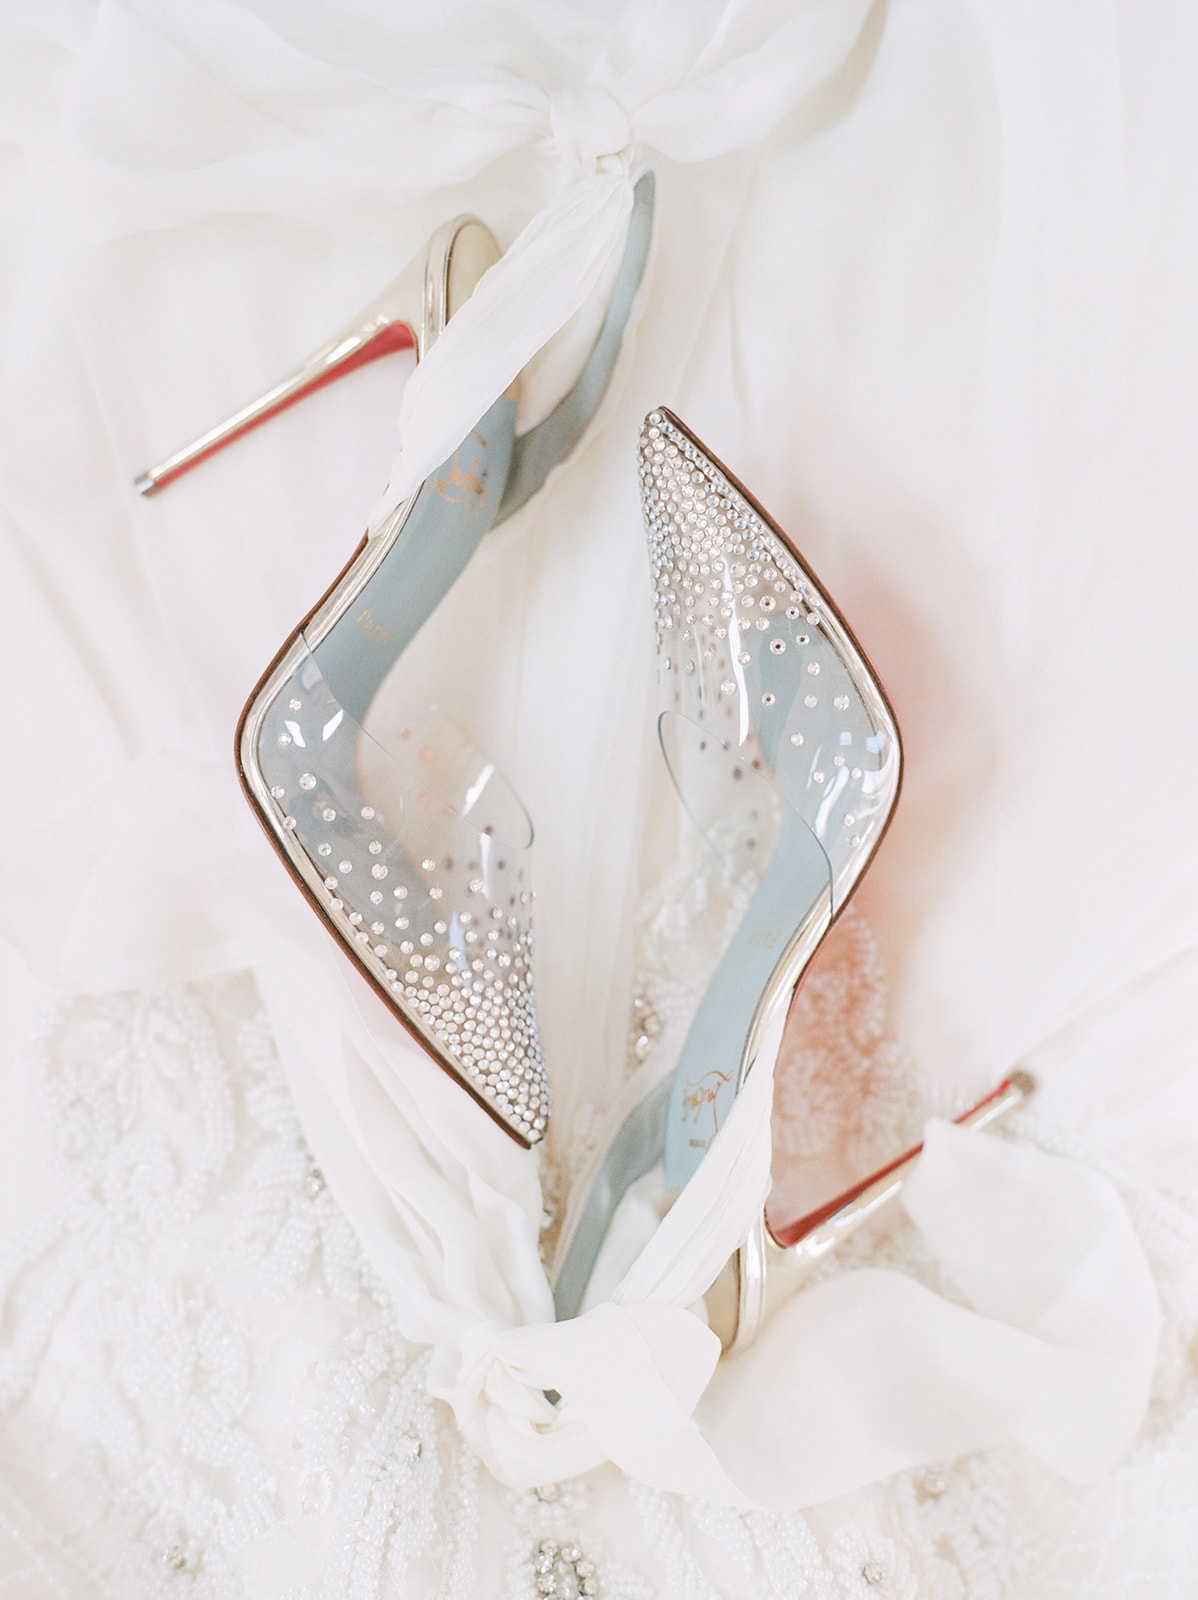 Louis Vuitton Wedding Shoes: Luxurious Knotting Hill Place Wedding